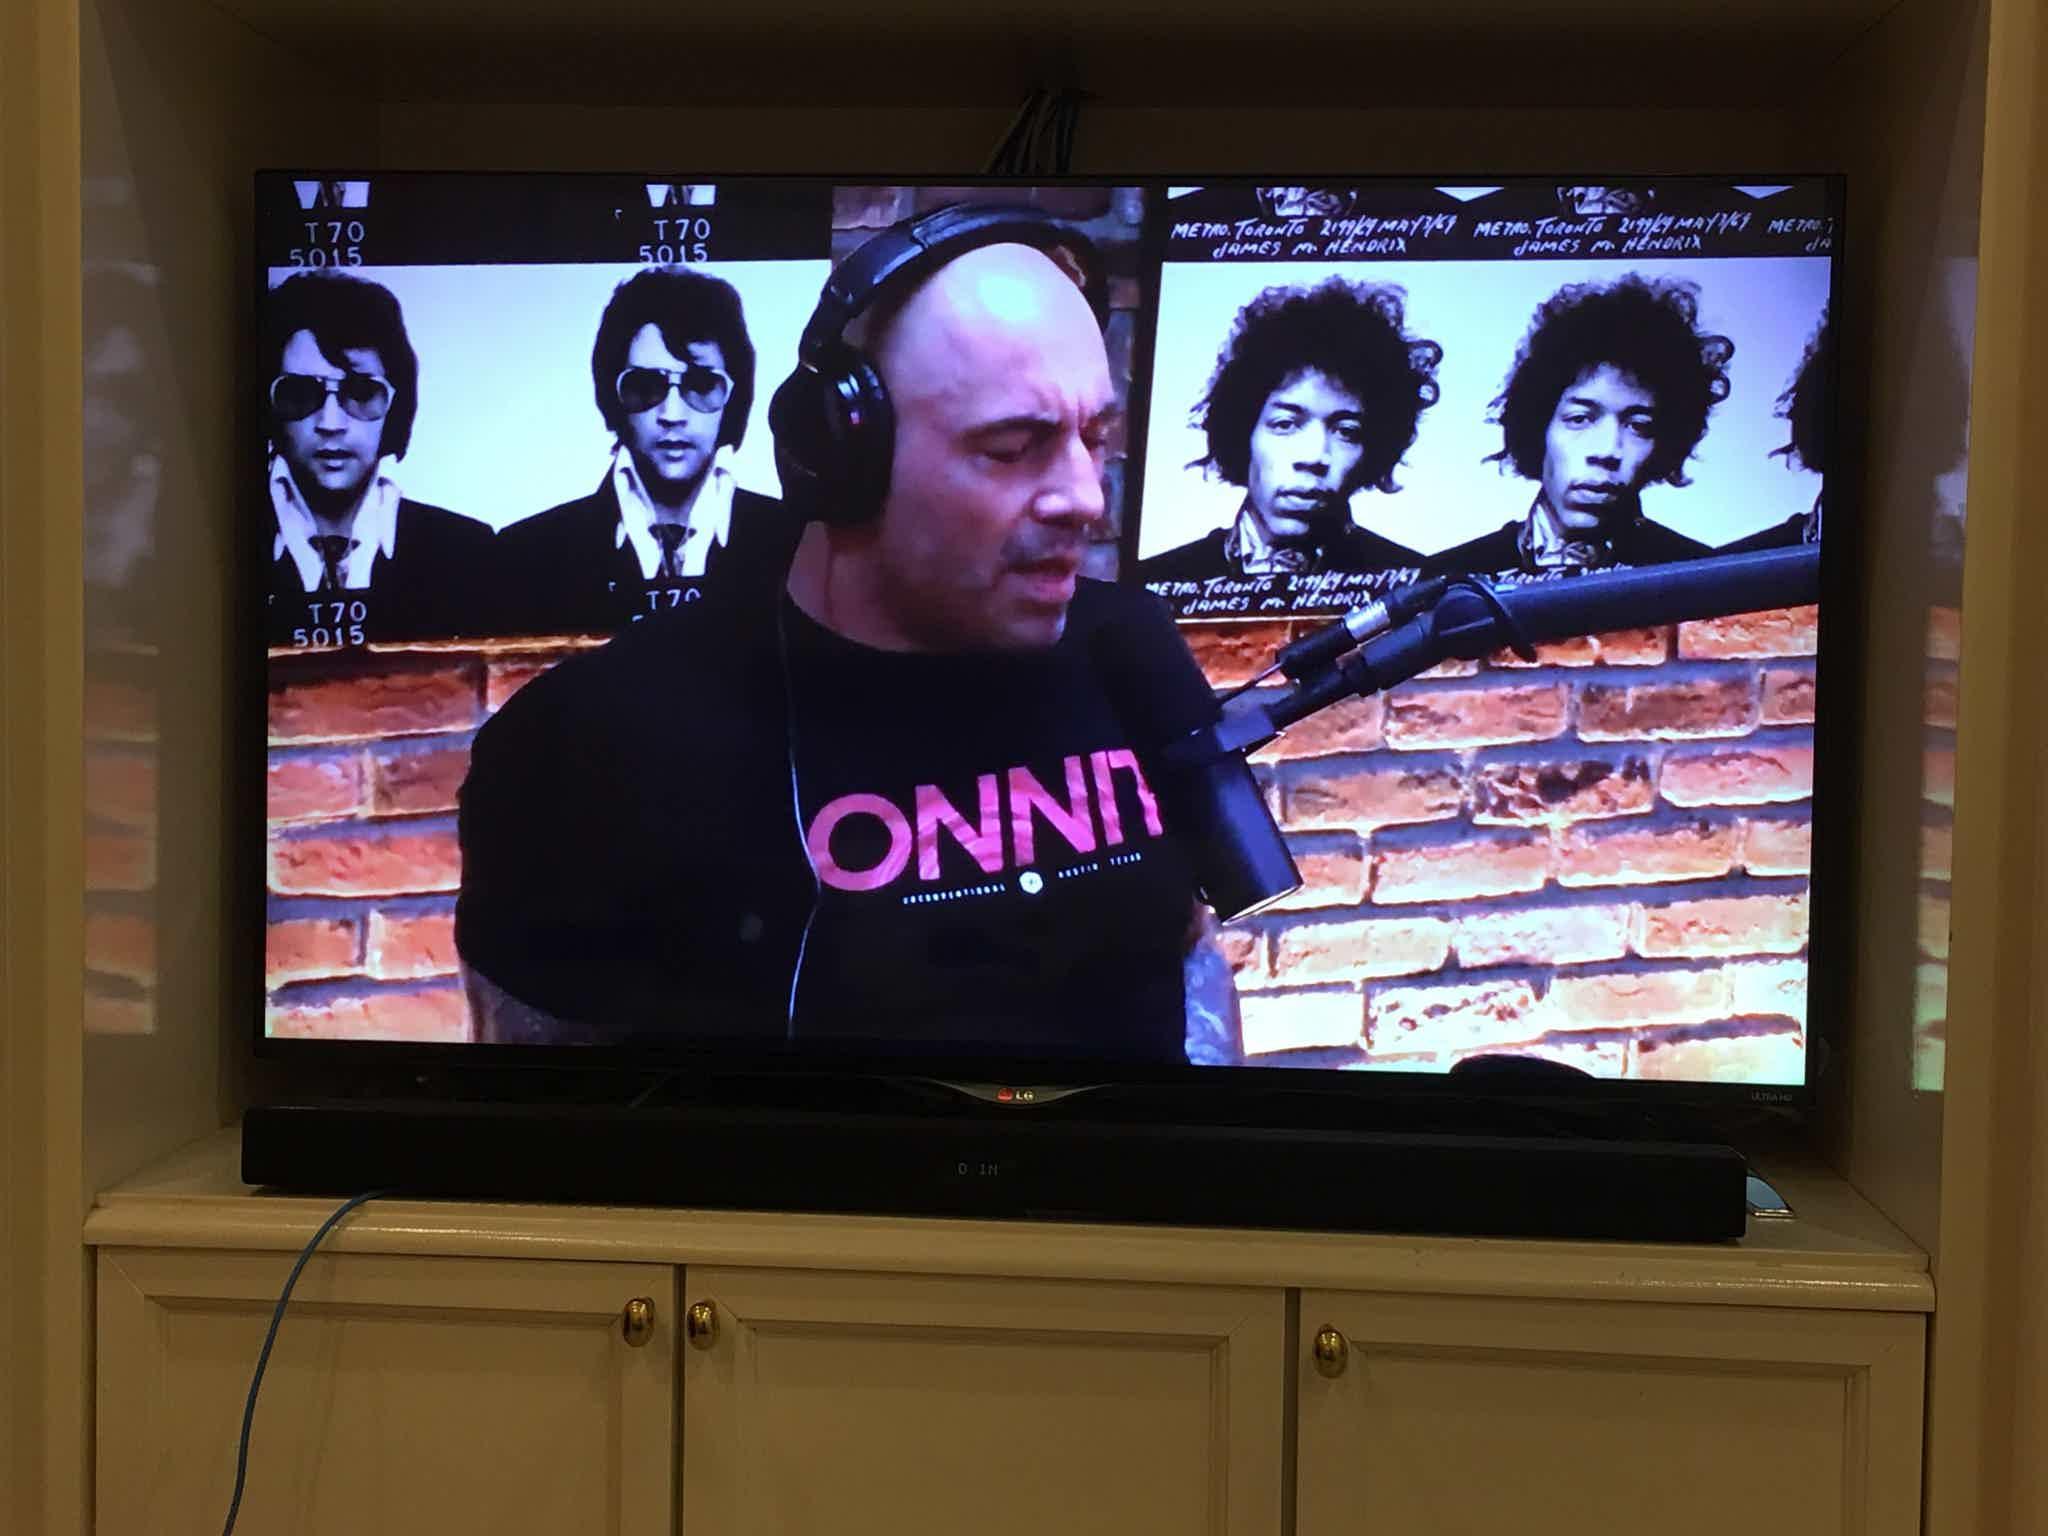 Joe Rogan on Smart TV